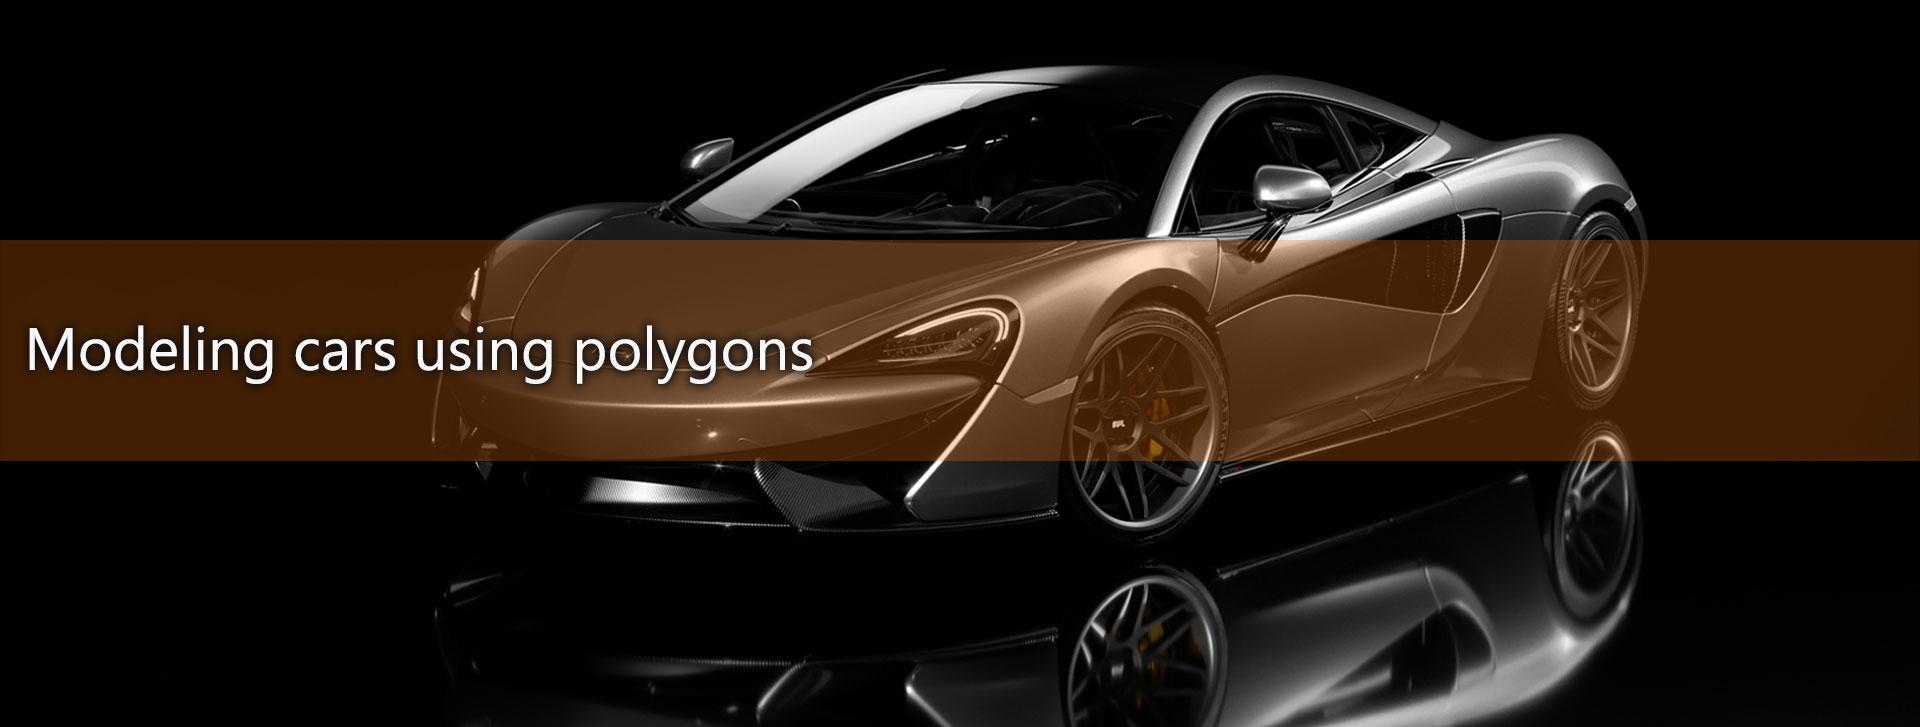 modeling using polygons car 3ds max maya2 1 - مدلسازی خودرو در تری دی مکس